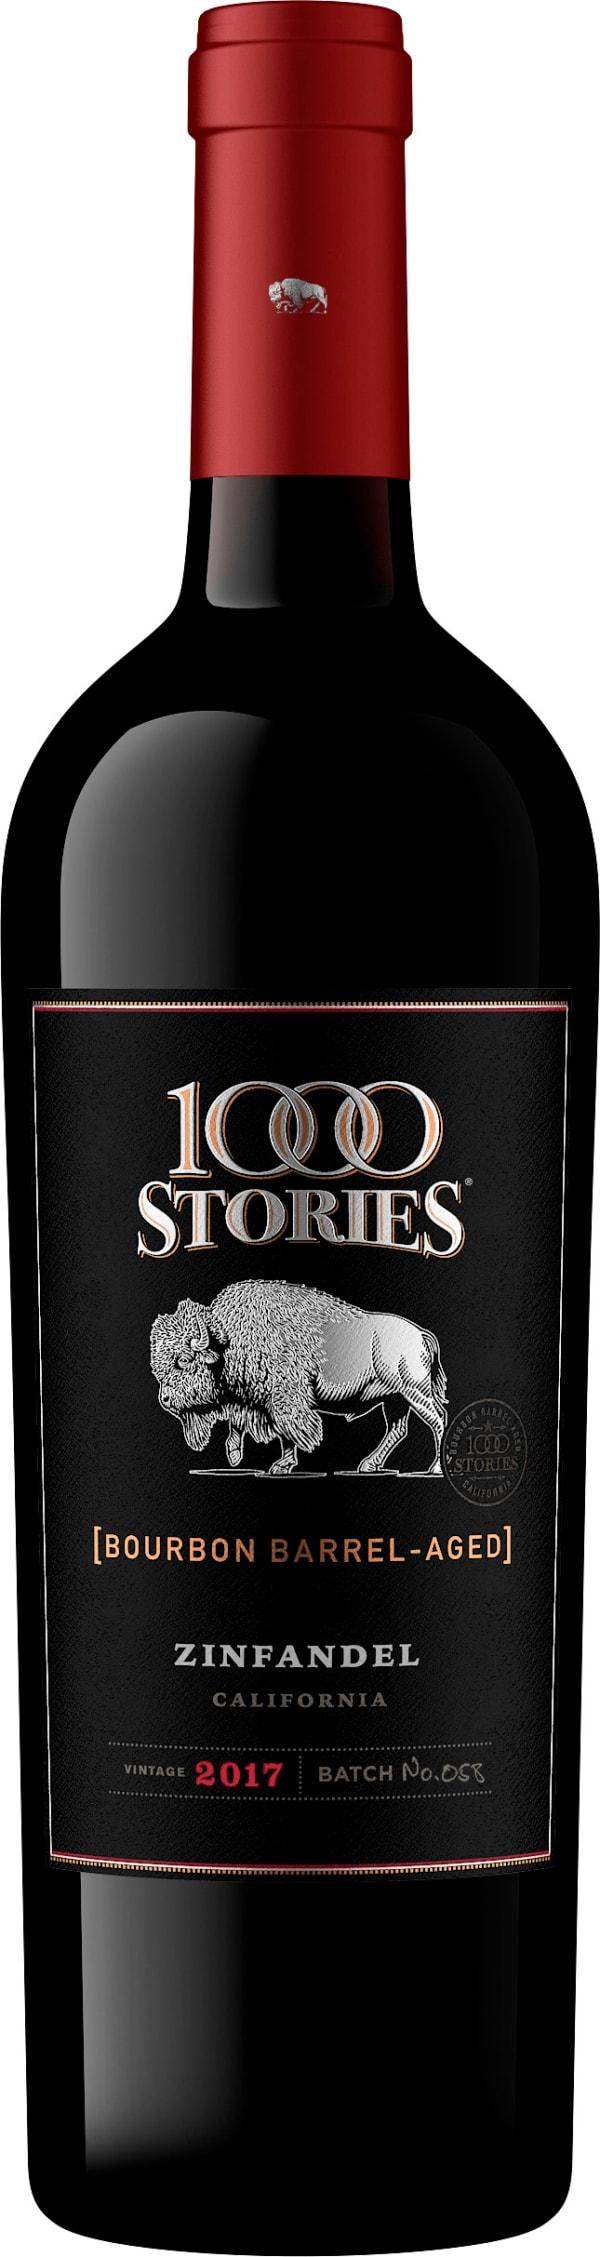 Fetzer 1000 Stories Zinfandel 2016